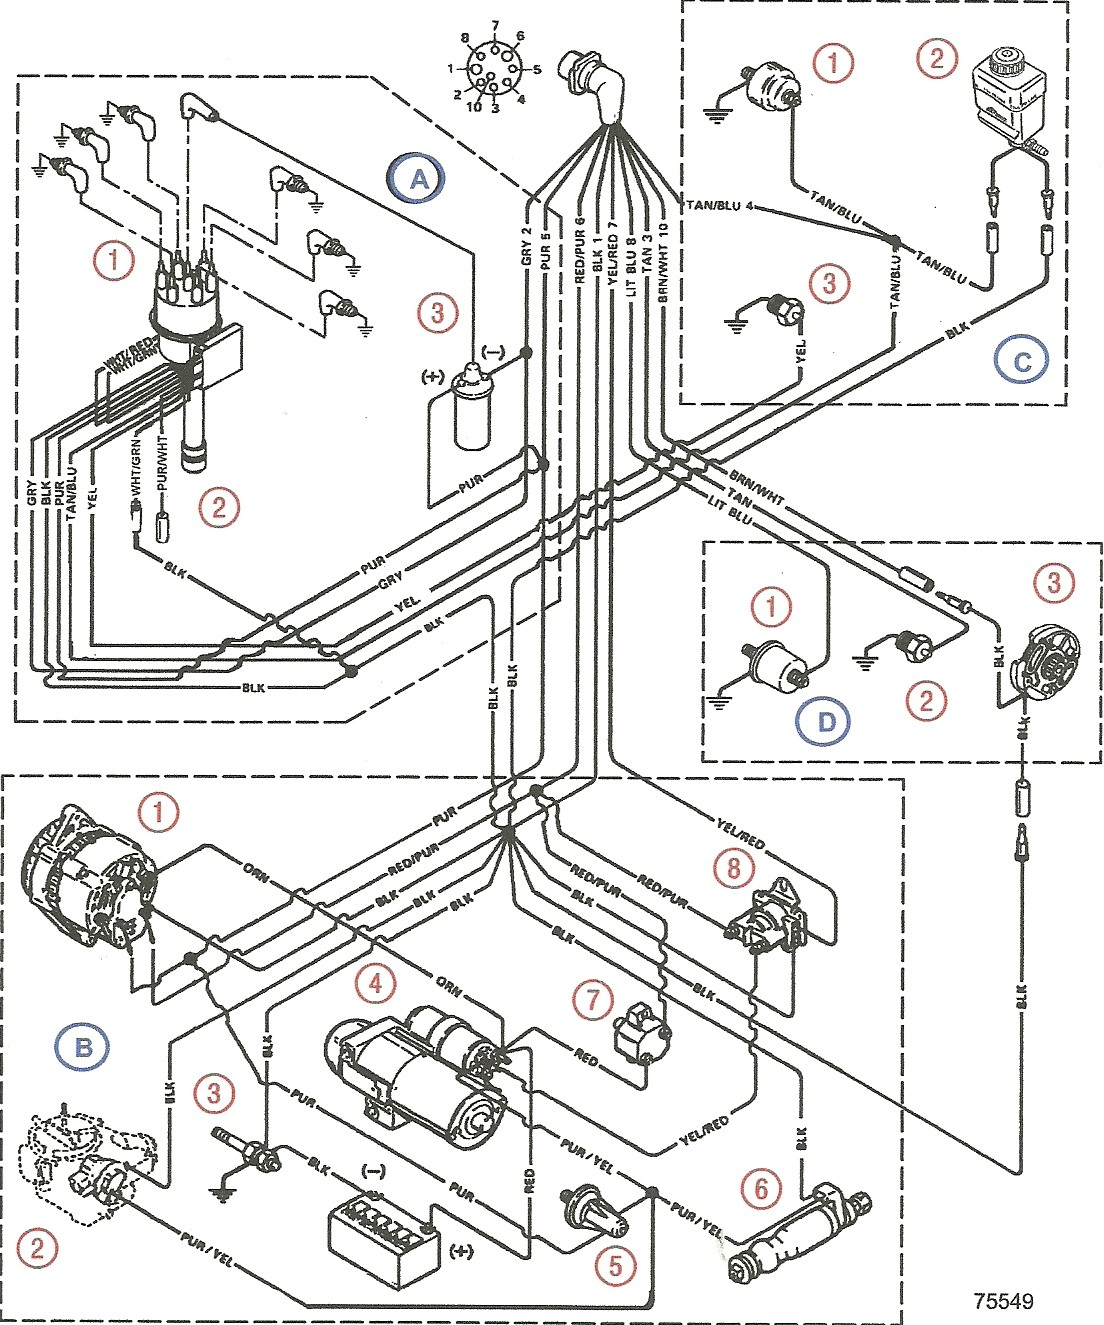 Trim Pump Wiring Diagram Schematics Diagrams Bennett Tabs Harness Mercruiser 3 0 Somurich Com Tab